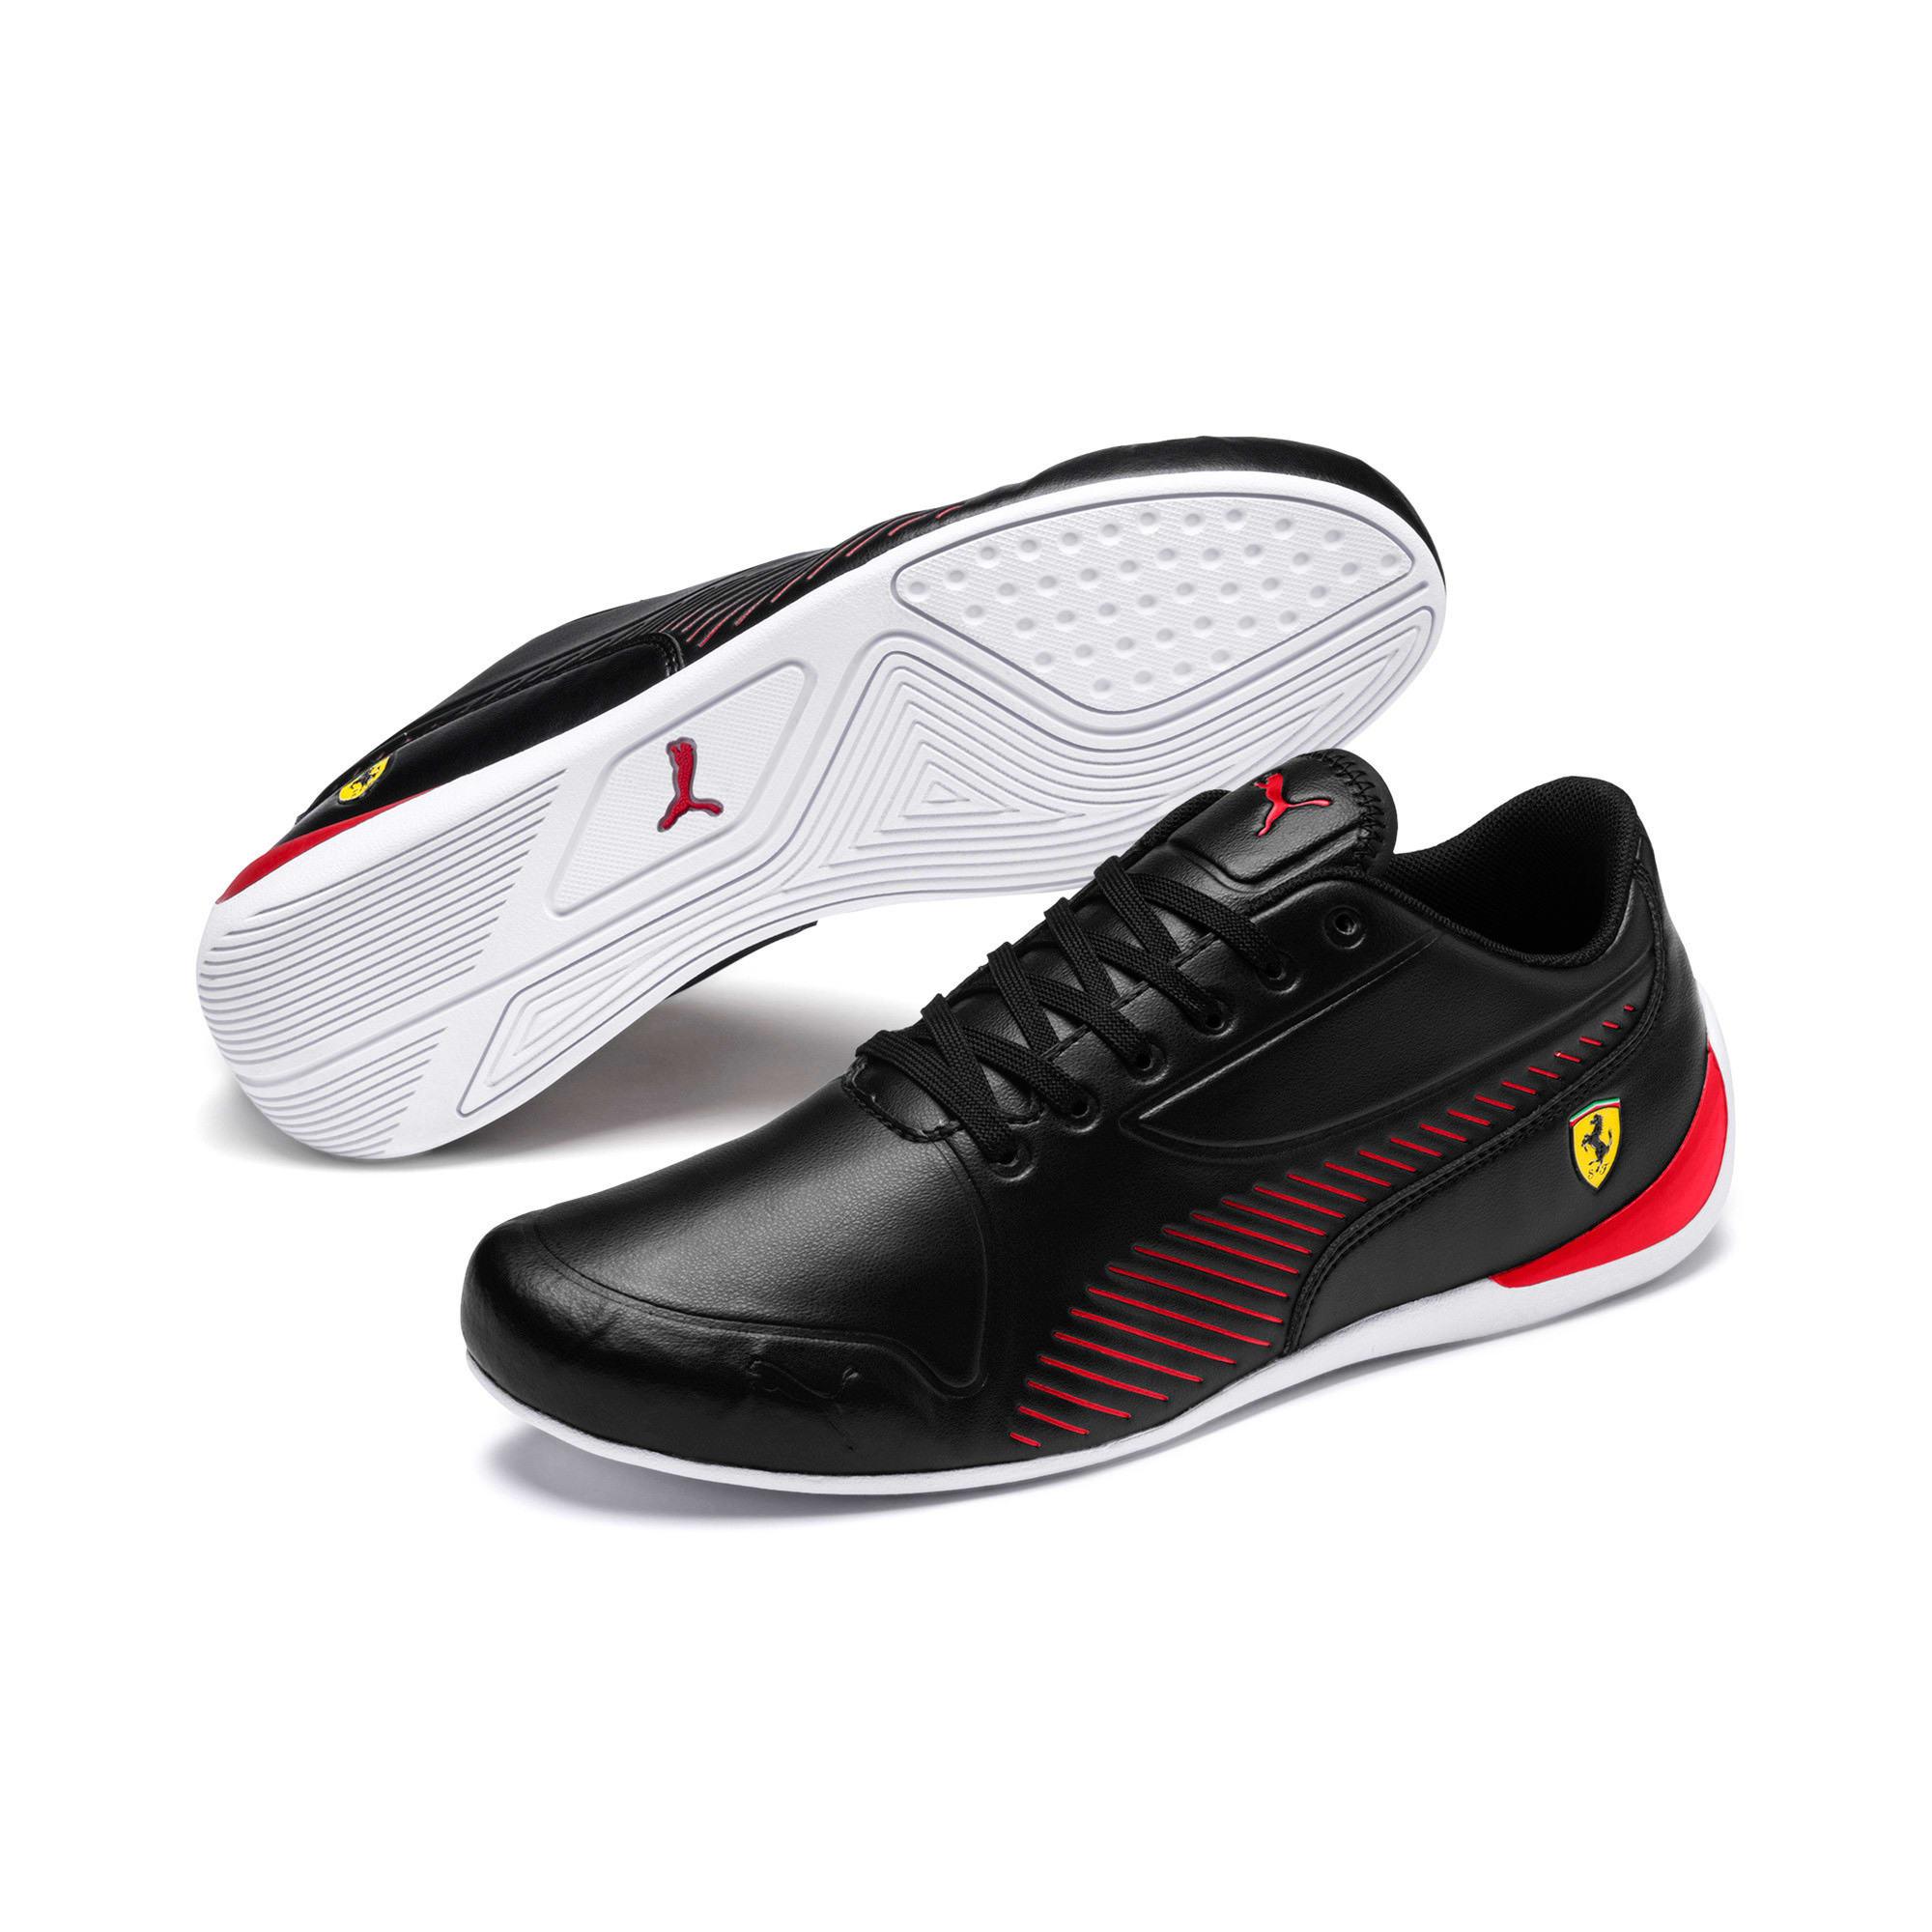 Miniatura 2 de Zapatos Scuderia Ferrari Drift Cat 7S Ultra para hombre, Puma Black-Rosso Corsa, mediano